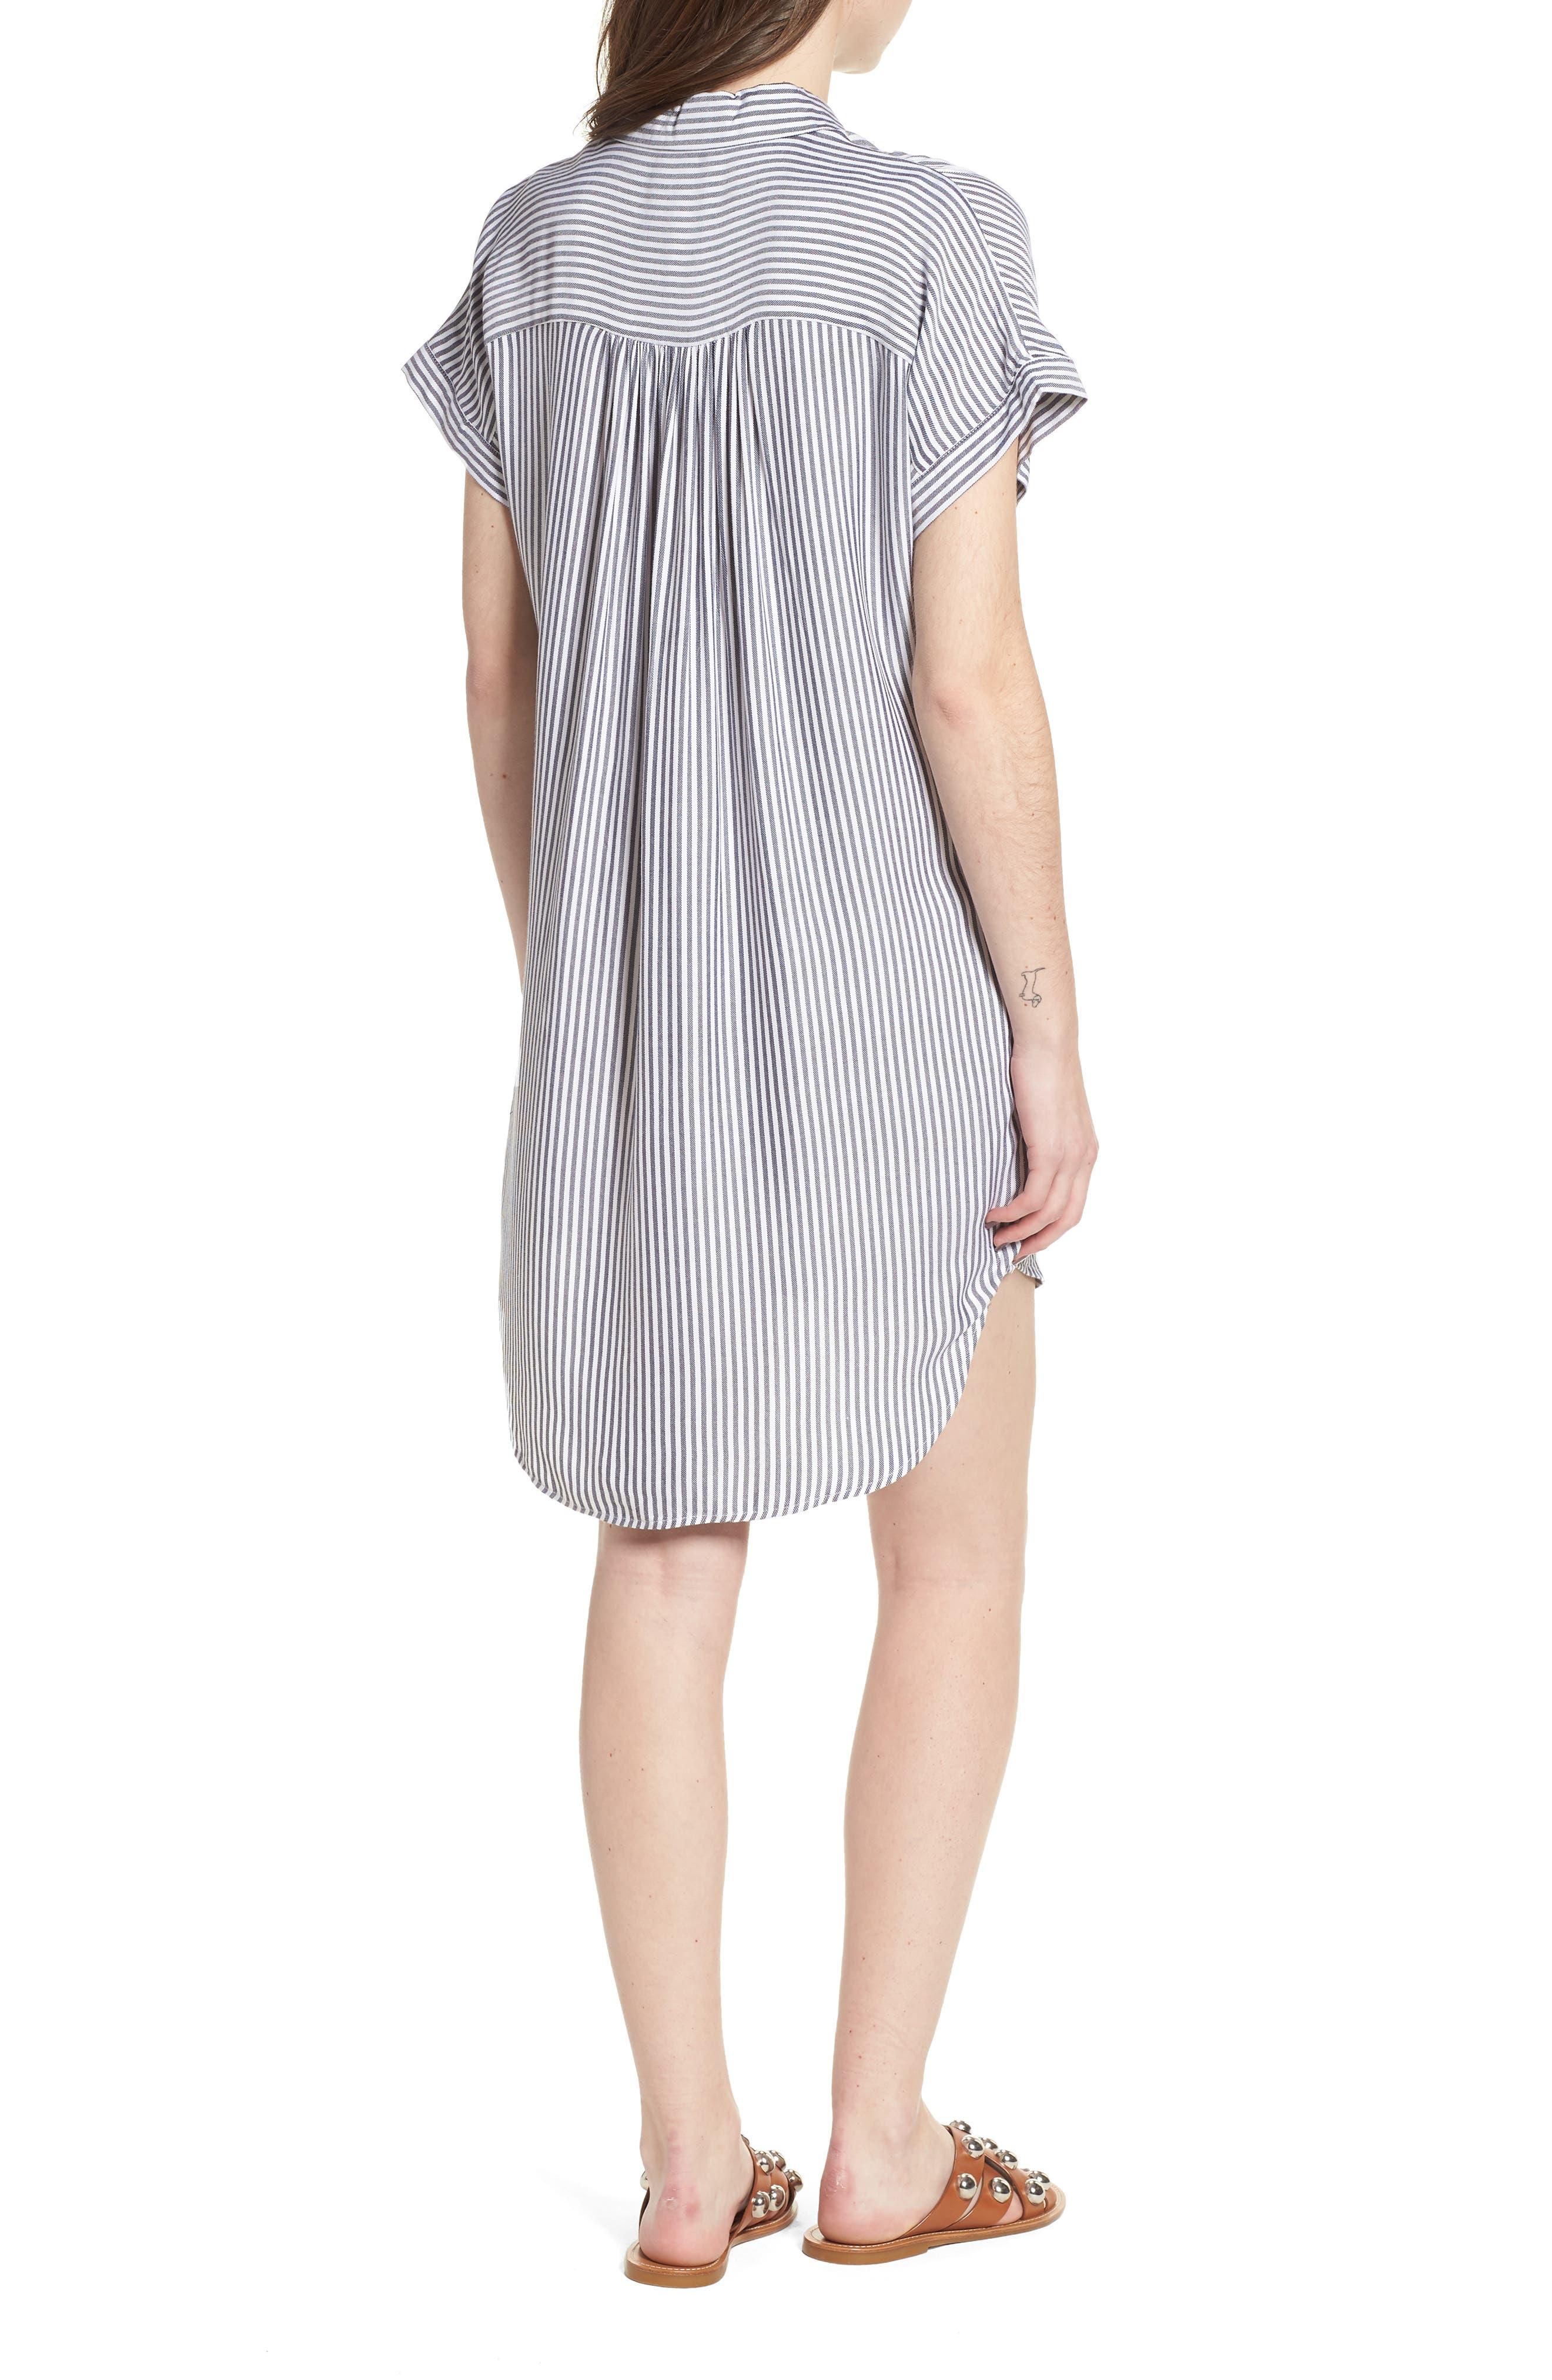 Skipper Stripe Shirtdress,                             Alternate thumbnail 2, color,                             400